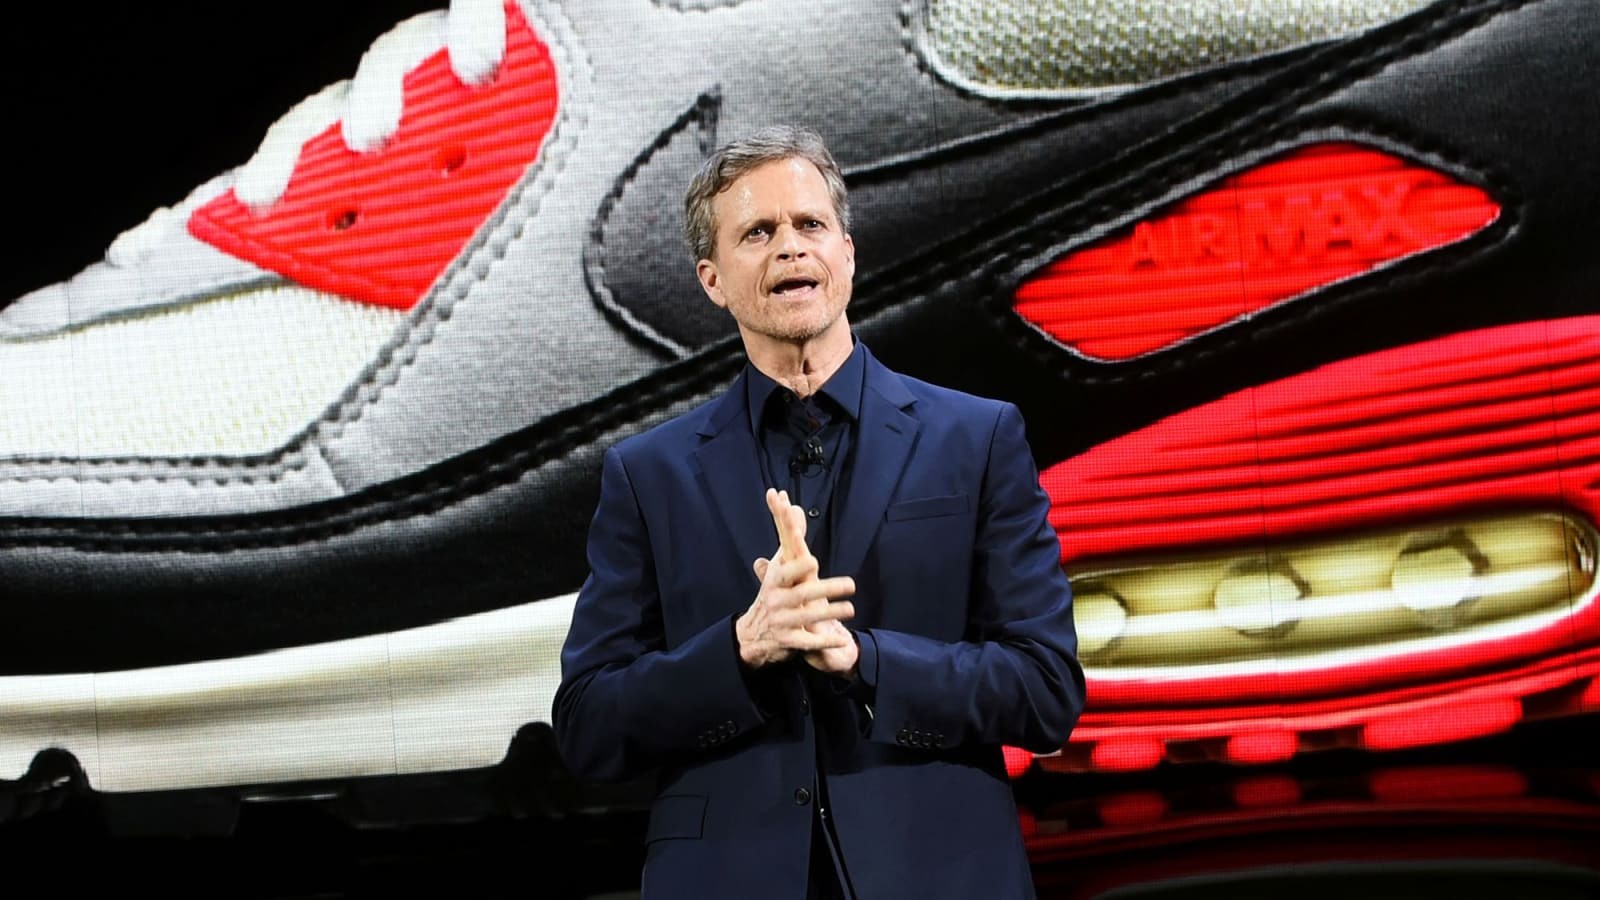 melón amargo carpeta  Nike shares fall despite earnings beat and 15 percent profit growth